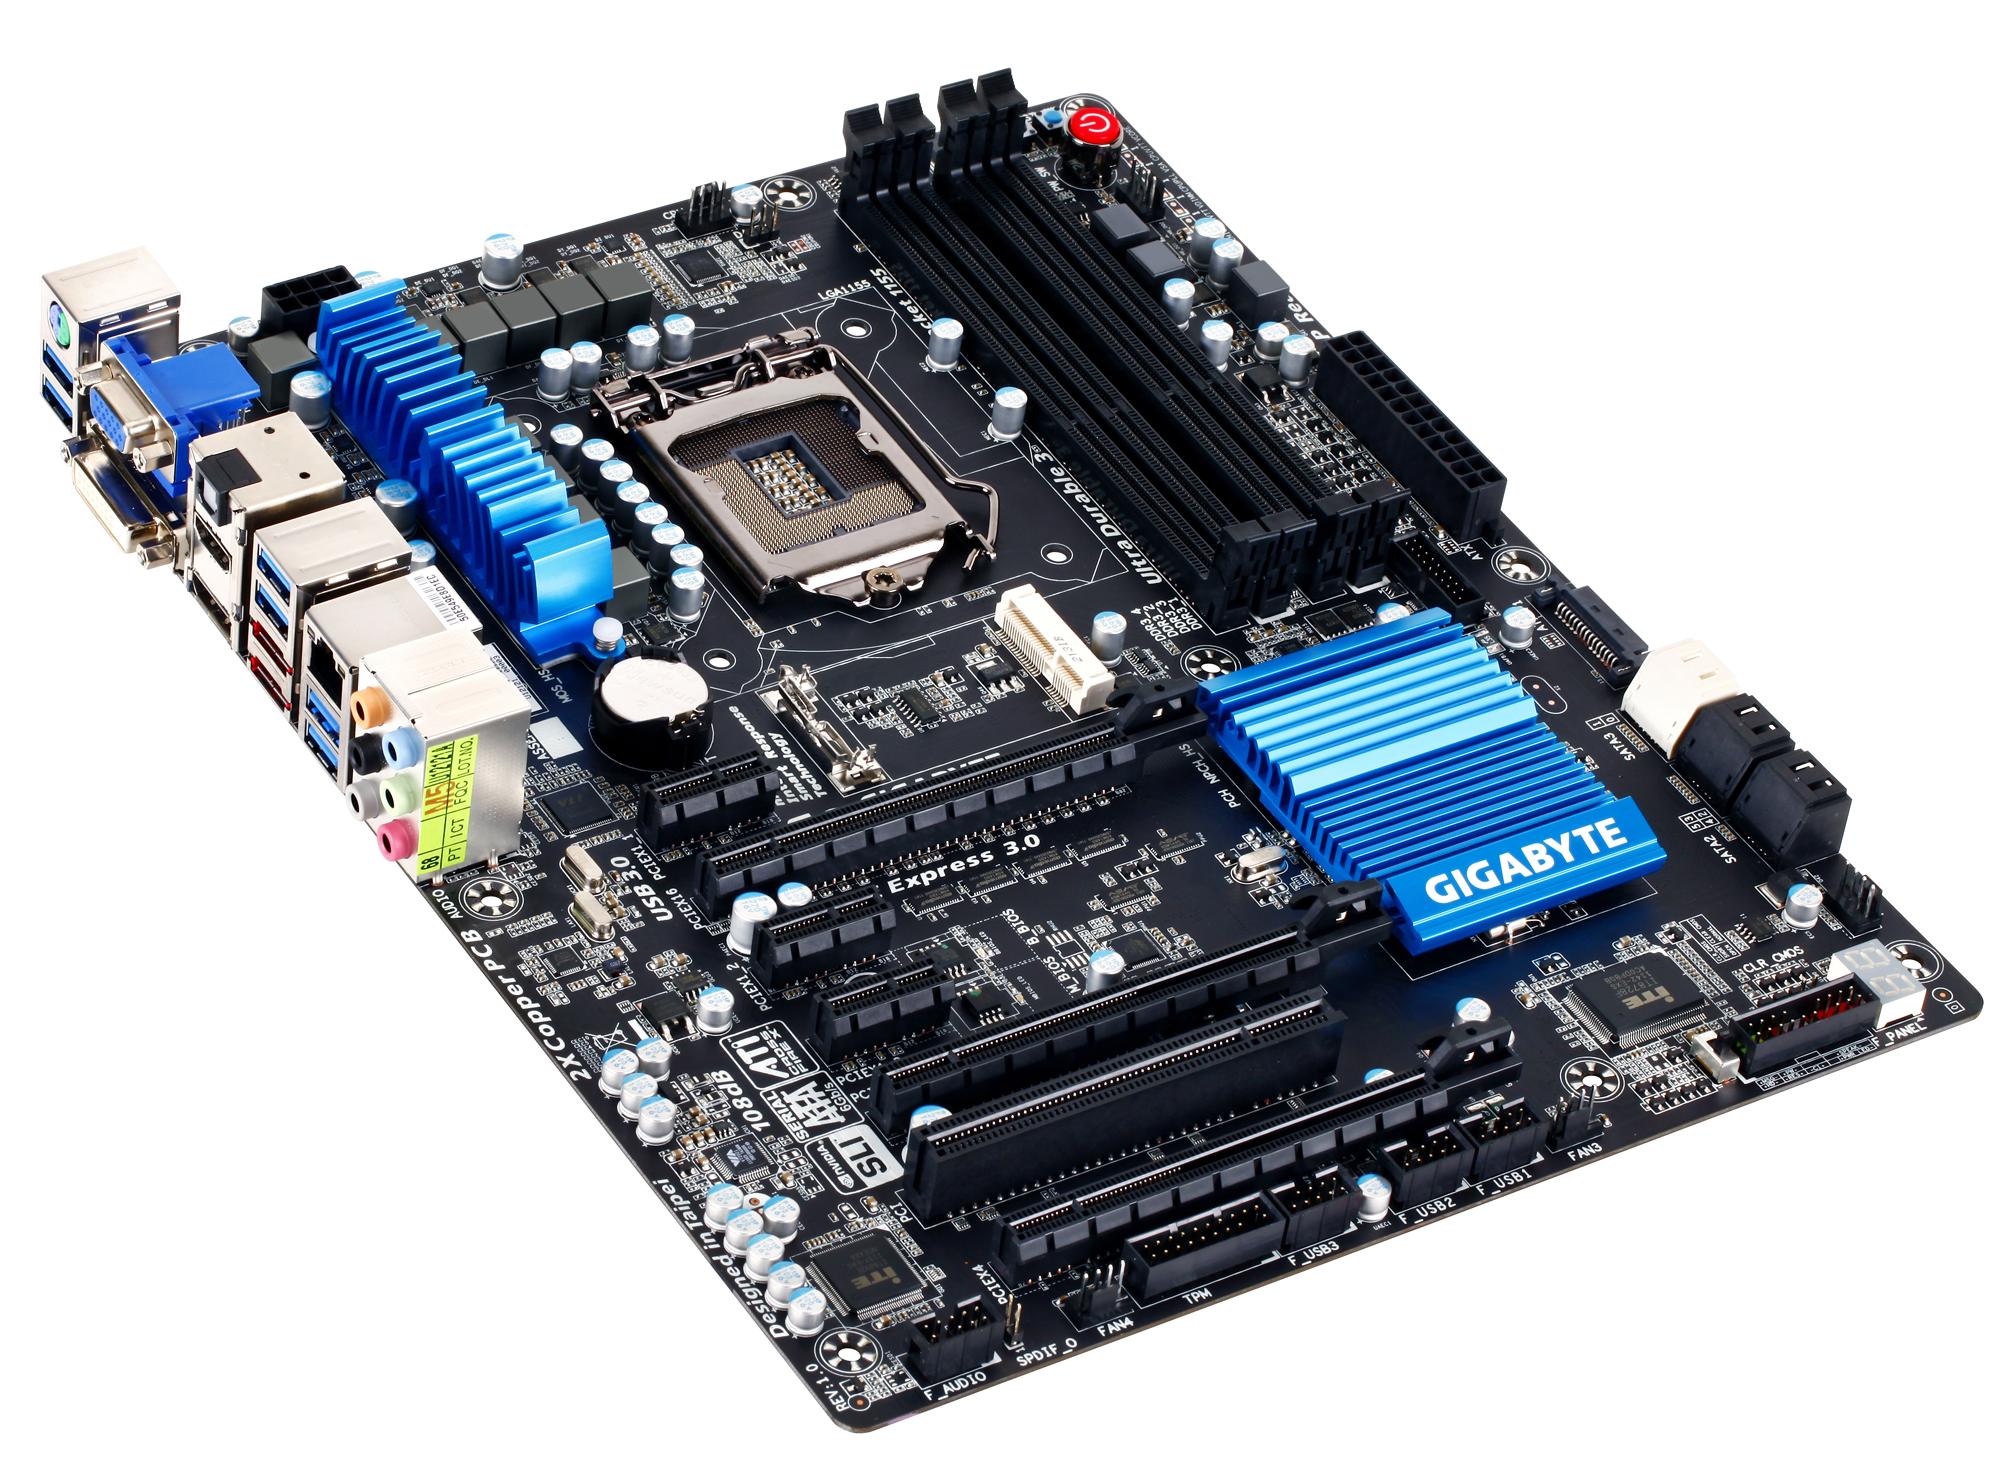 Gigabyte GA-Z77X-UD3H Marvell SATA Windows 8 X64 Driver Download